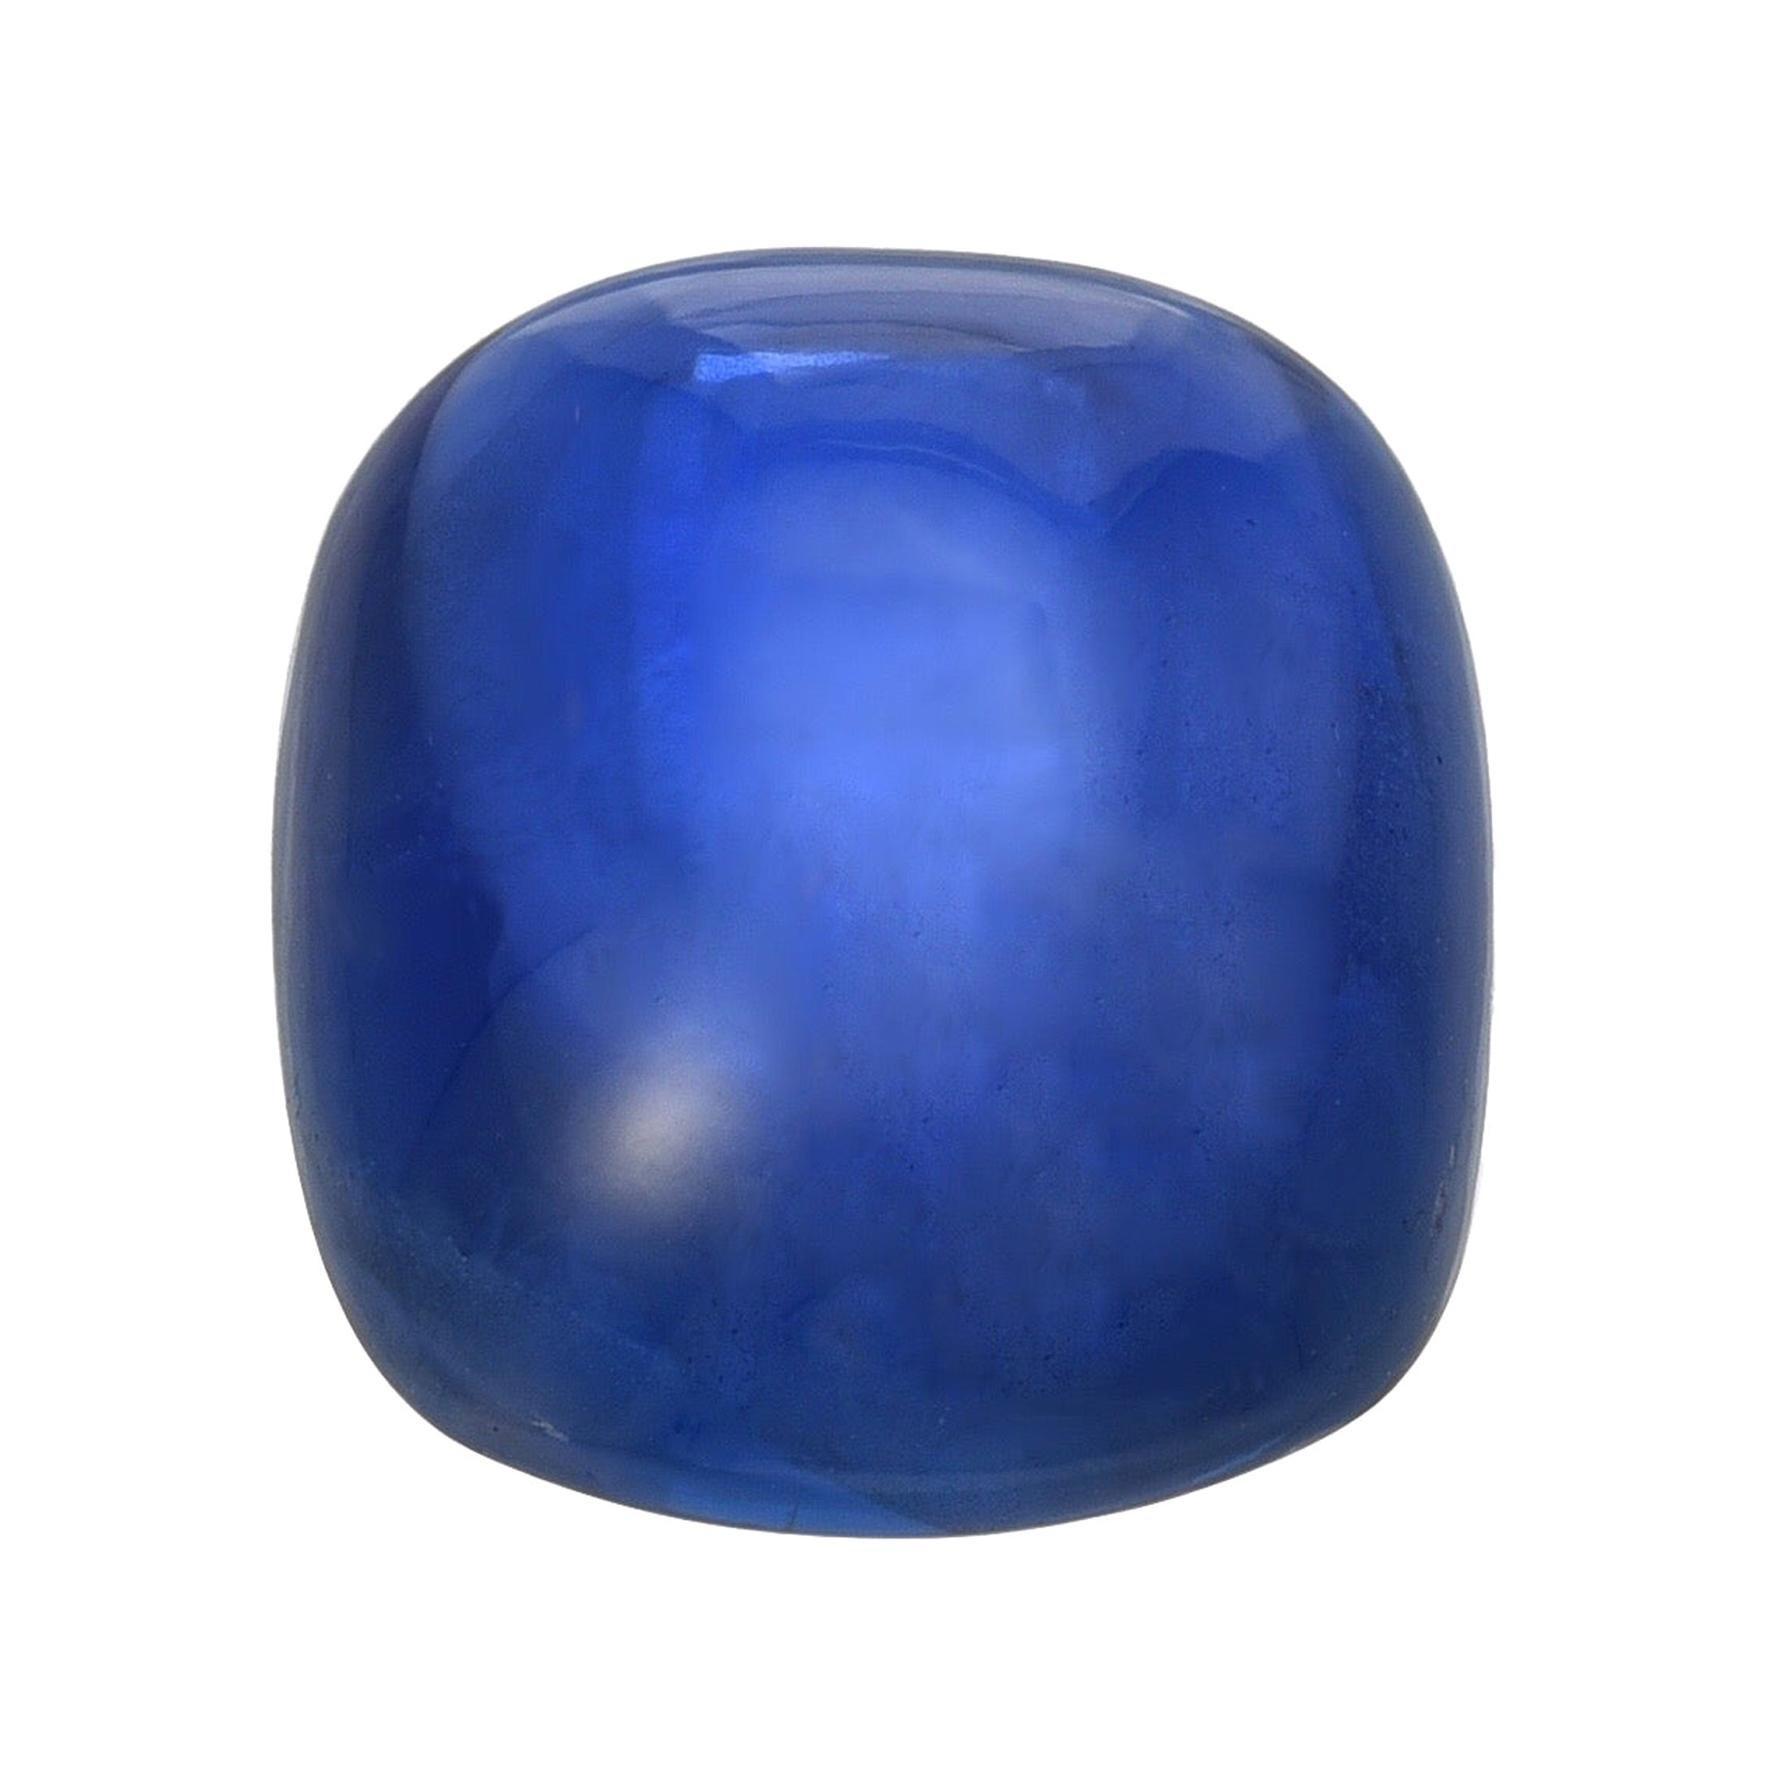 Unheated Burma Sapphire Cabochon Ring Gem 15.77 Carats No Heat Loose Gemstone